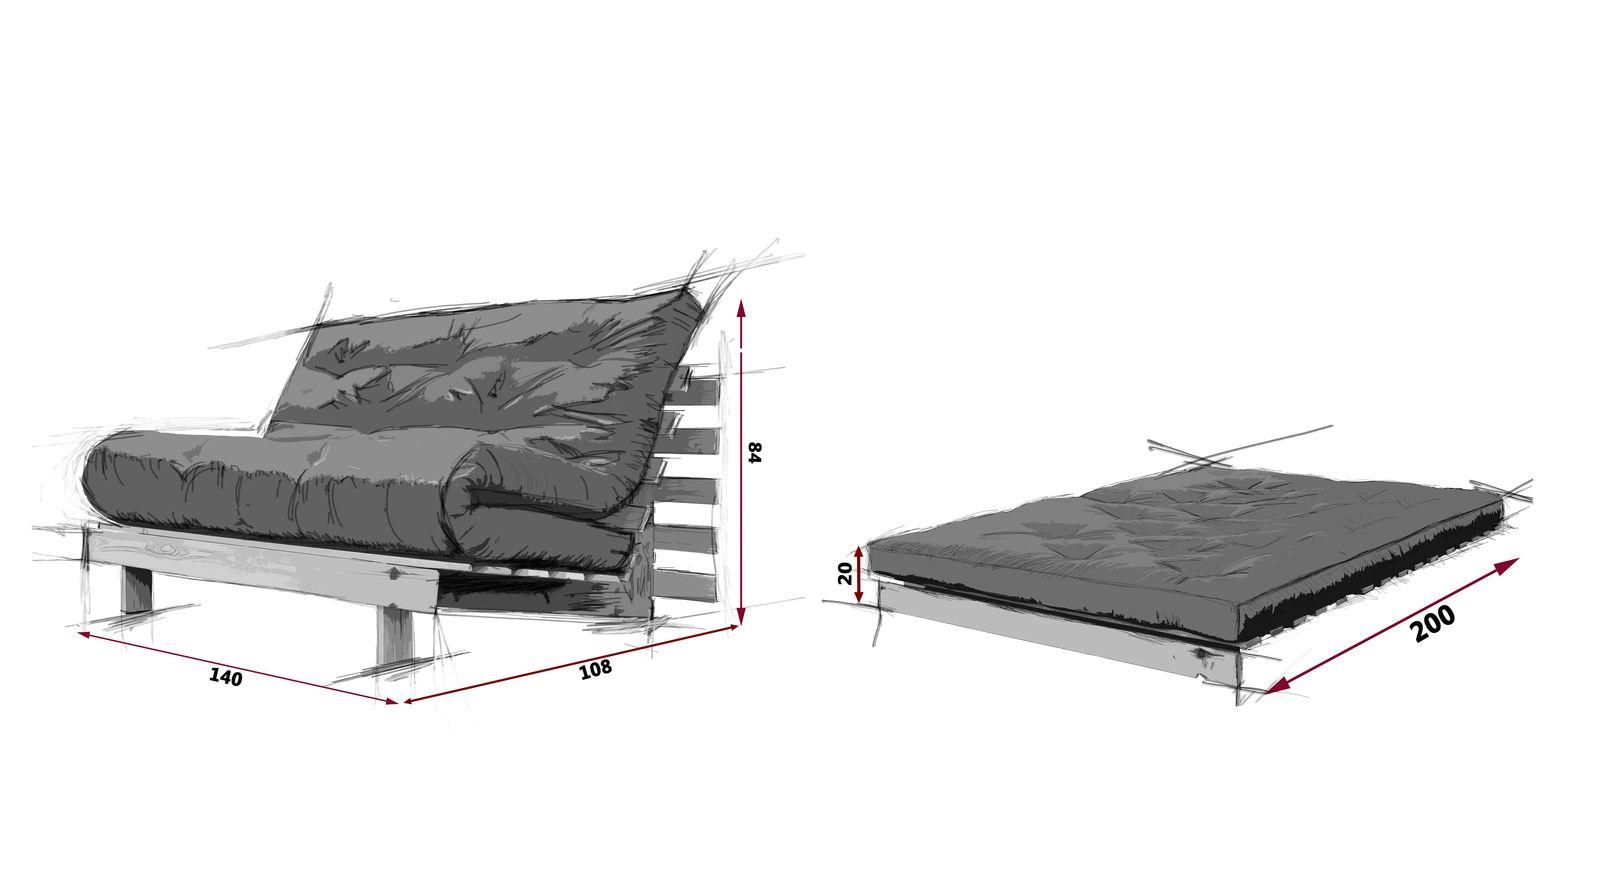 Maßgrafik des Futonsofas Campoli mit 140 cm